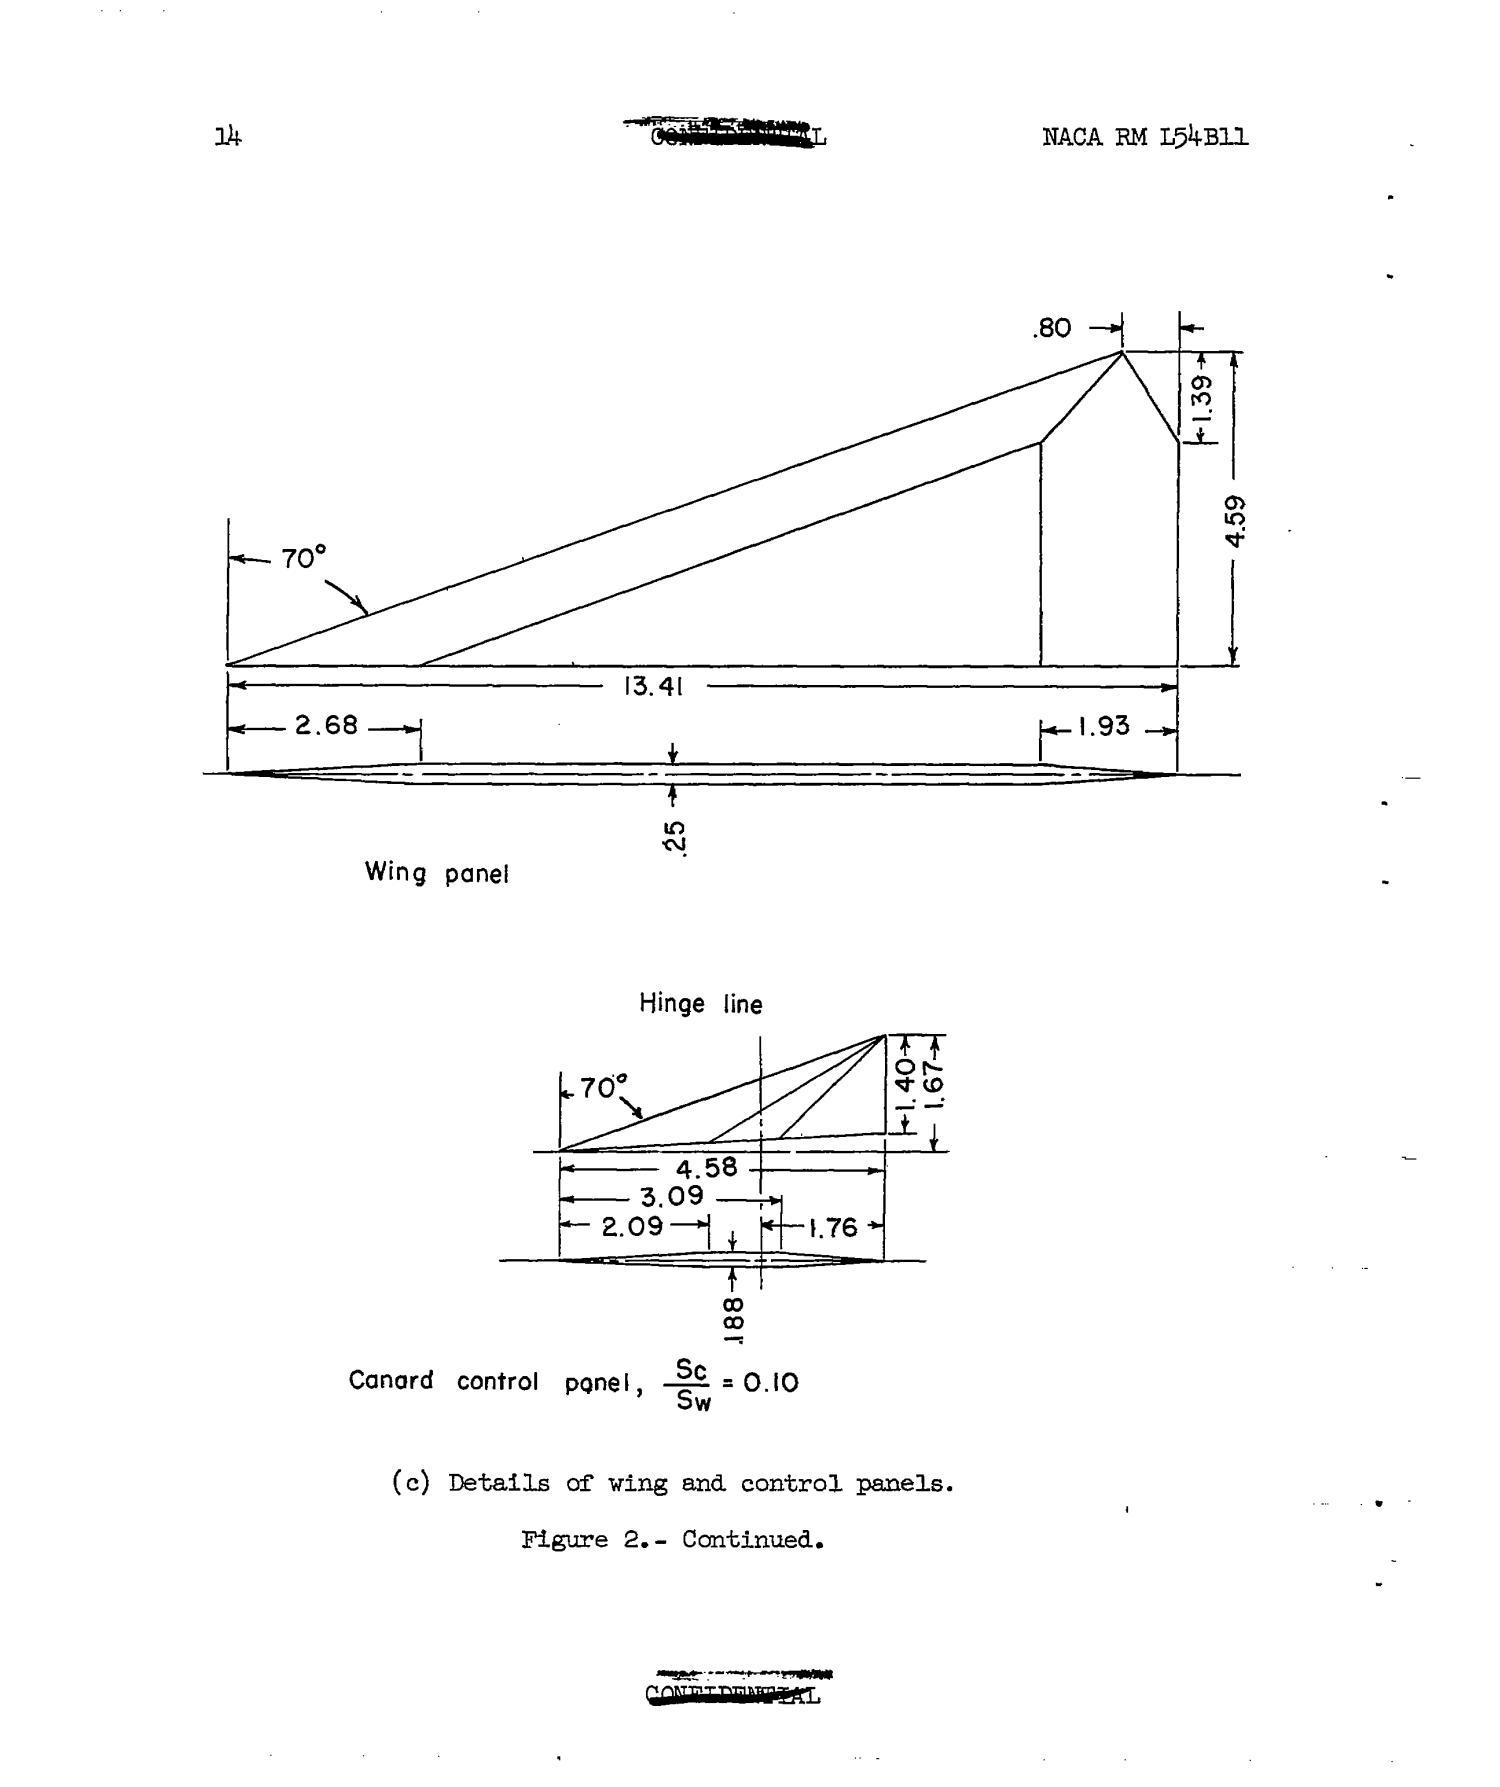 Aerodynamic characteristics of a cruciform-wing missile